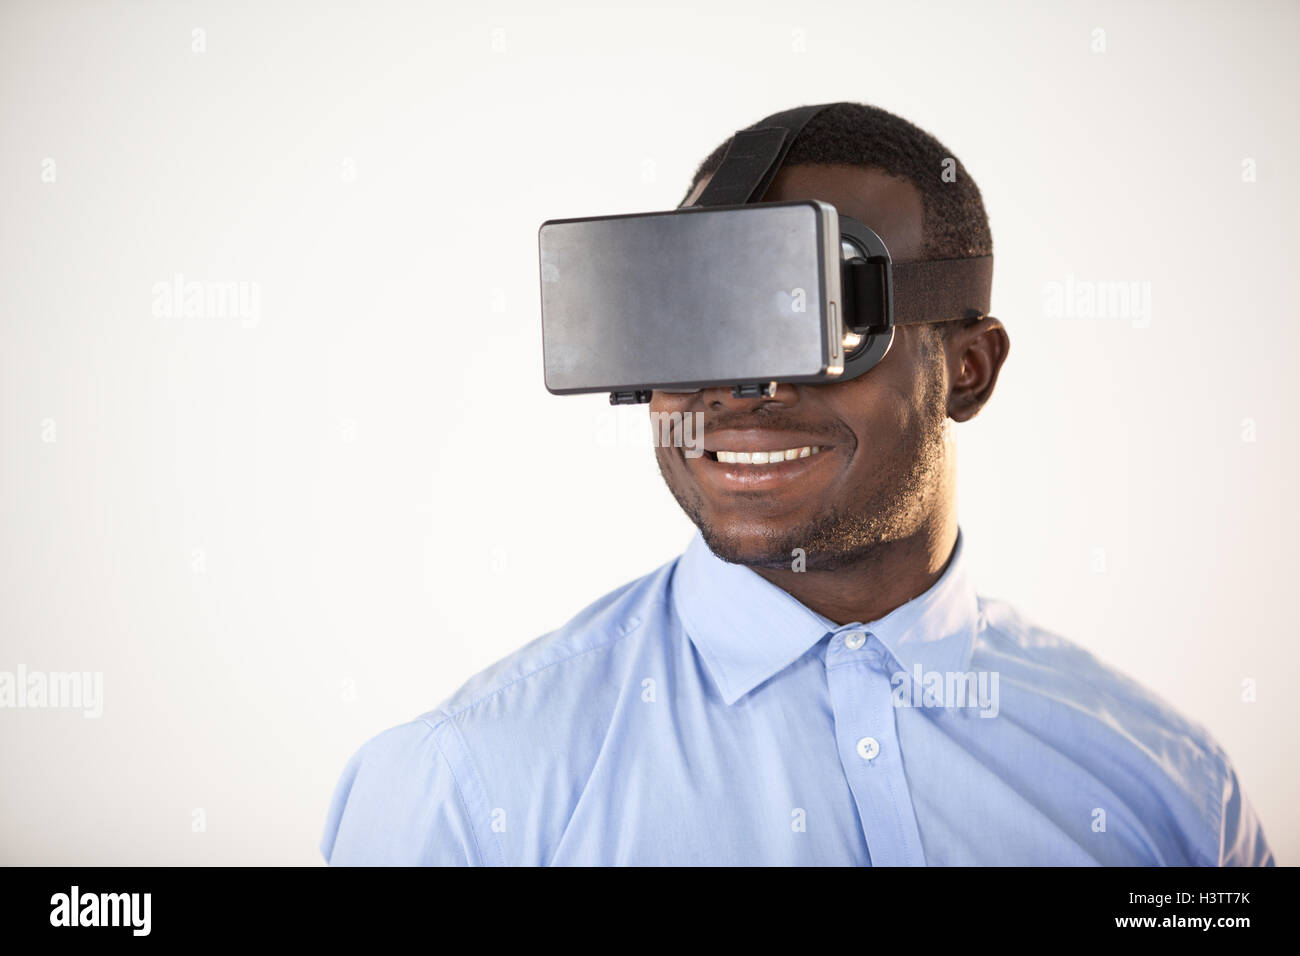 Man using virtual reality headset - Stock Image